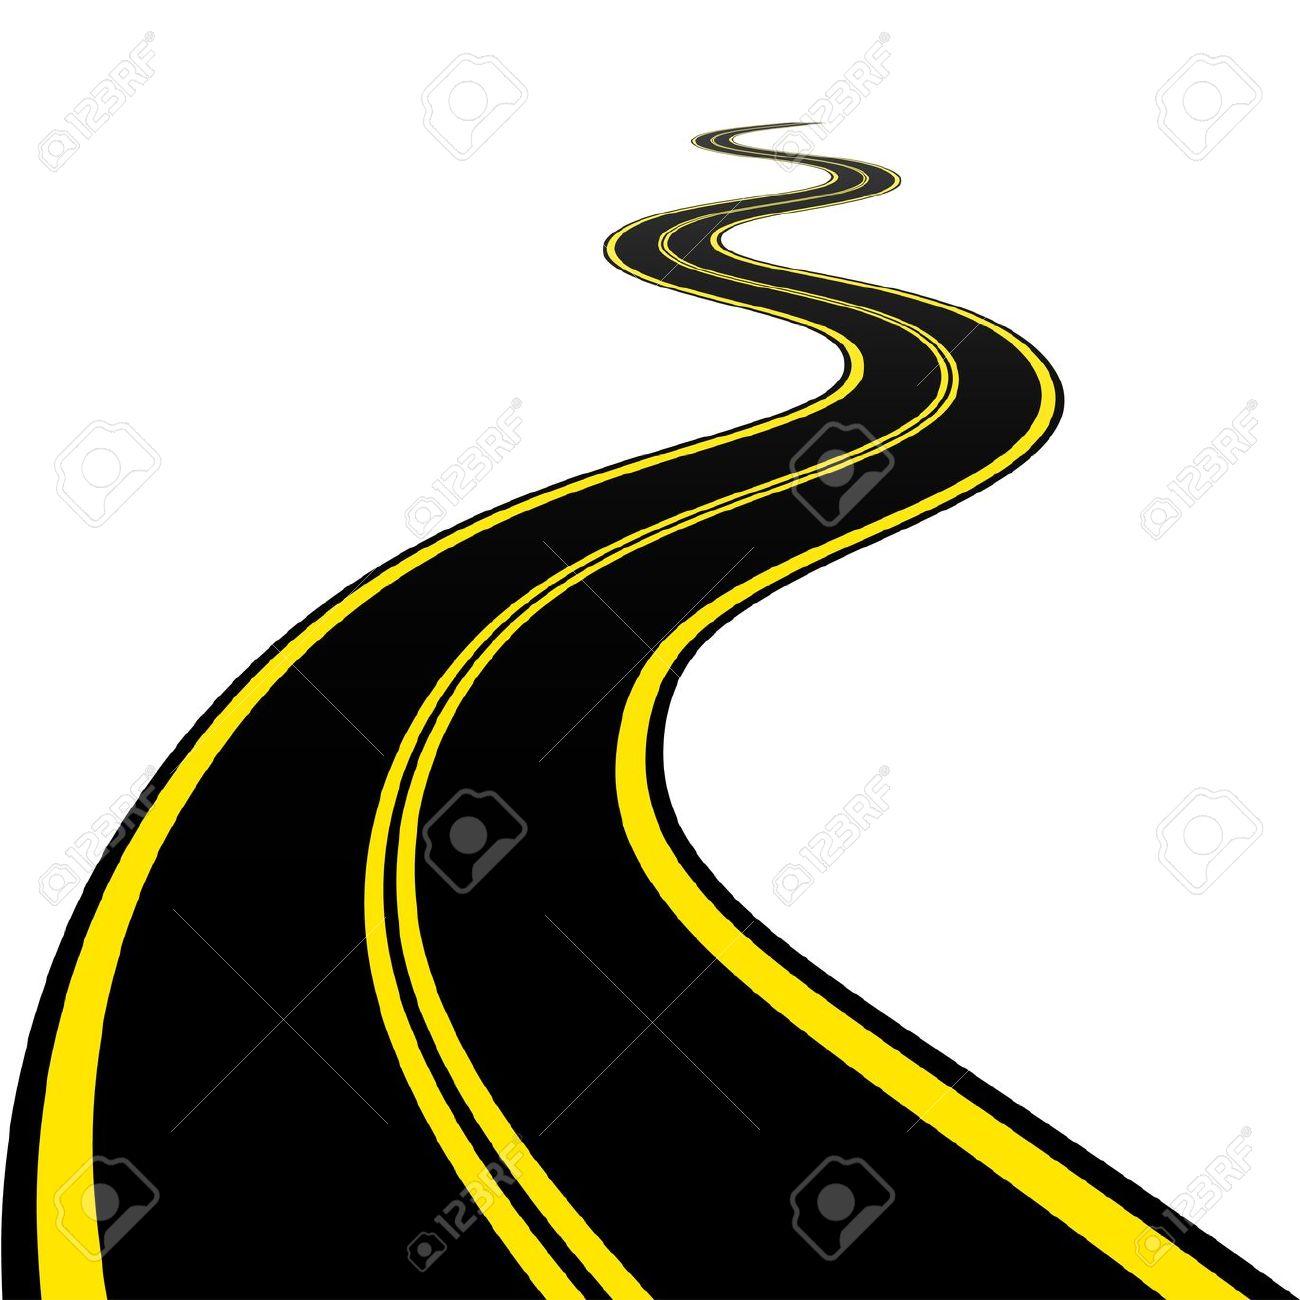 winding road: Winding road